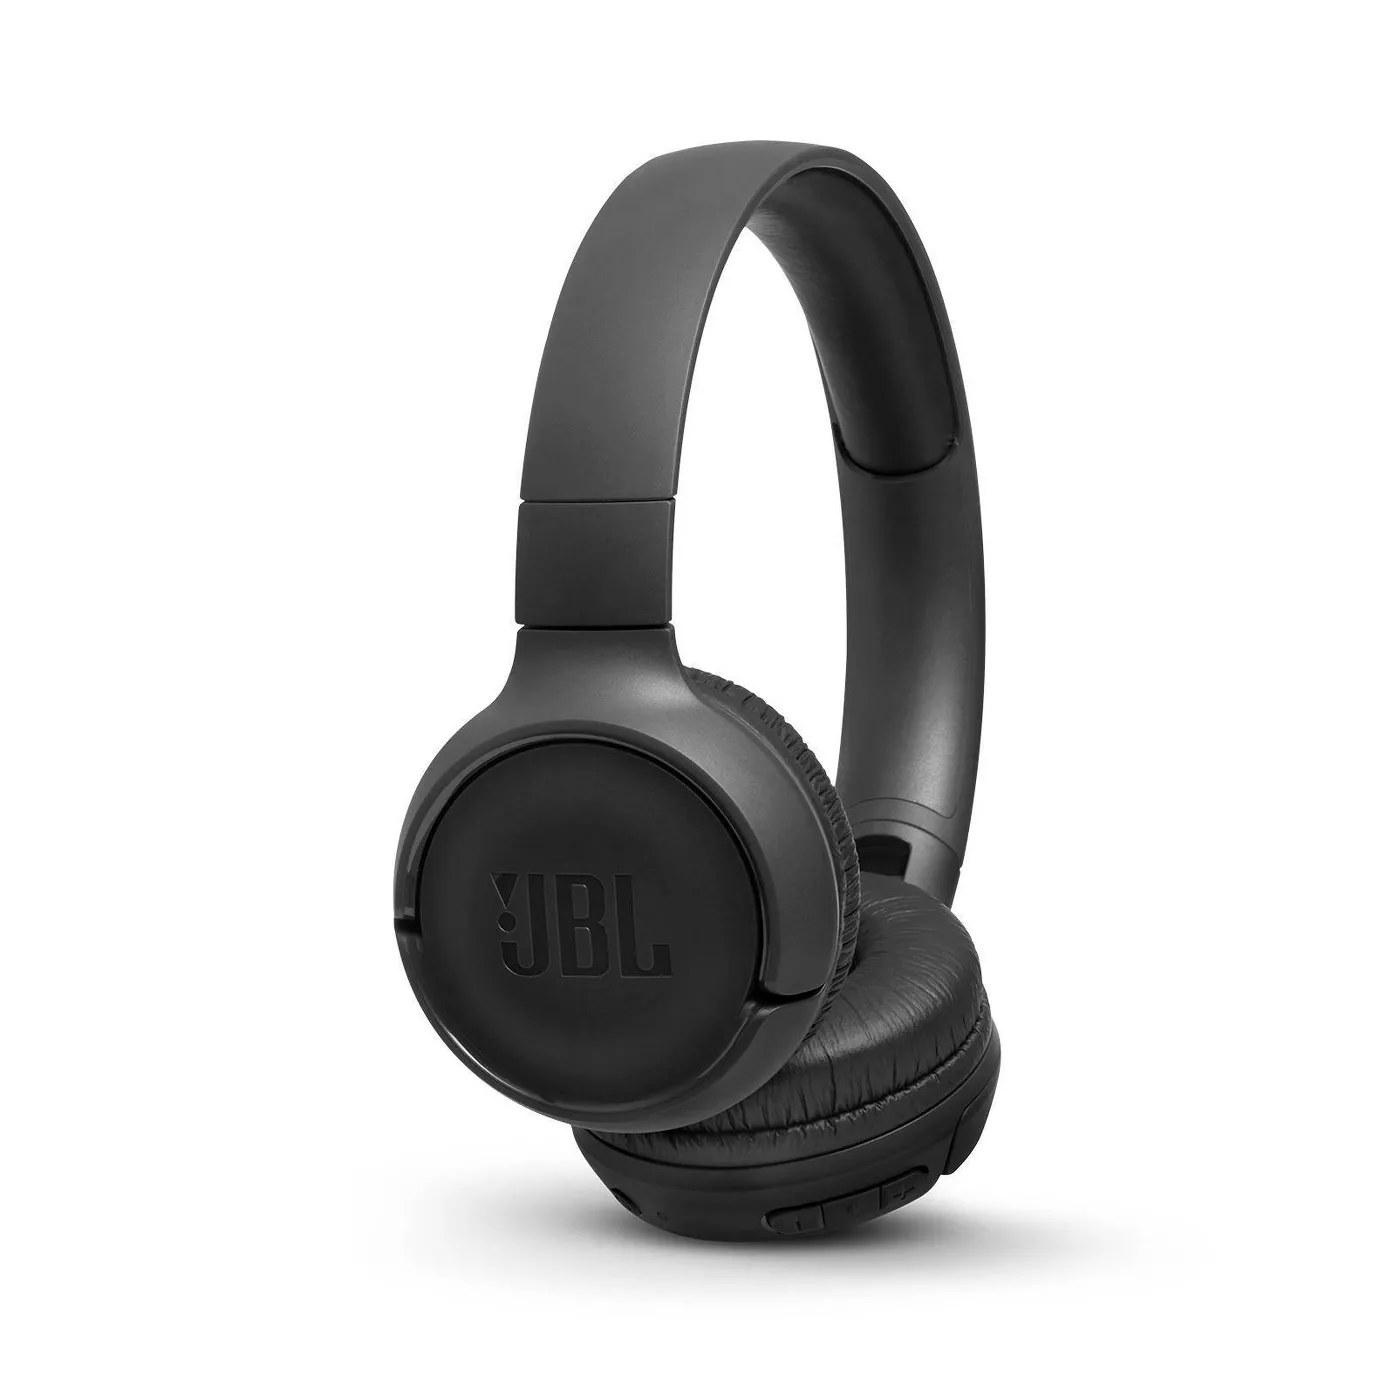 The black, JBL headphones